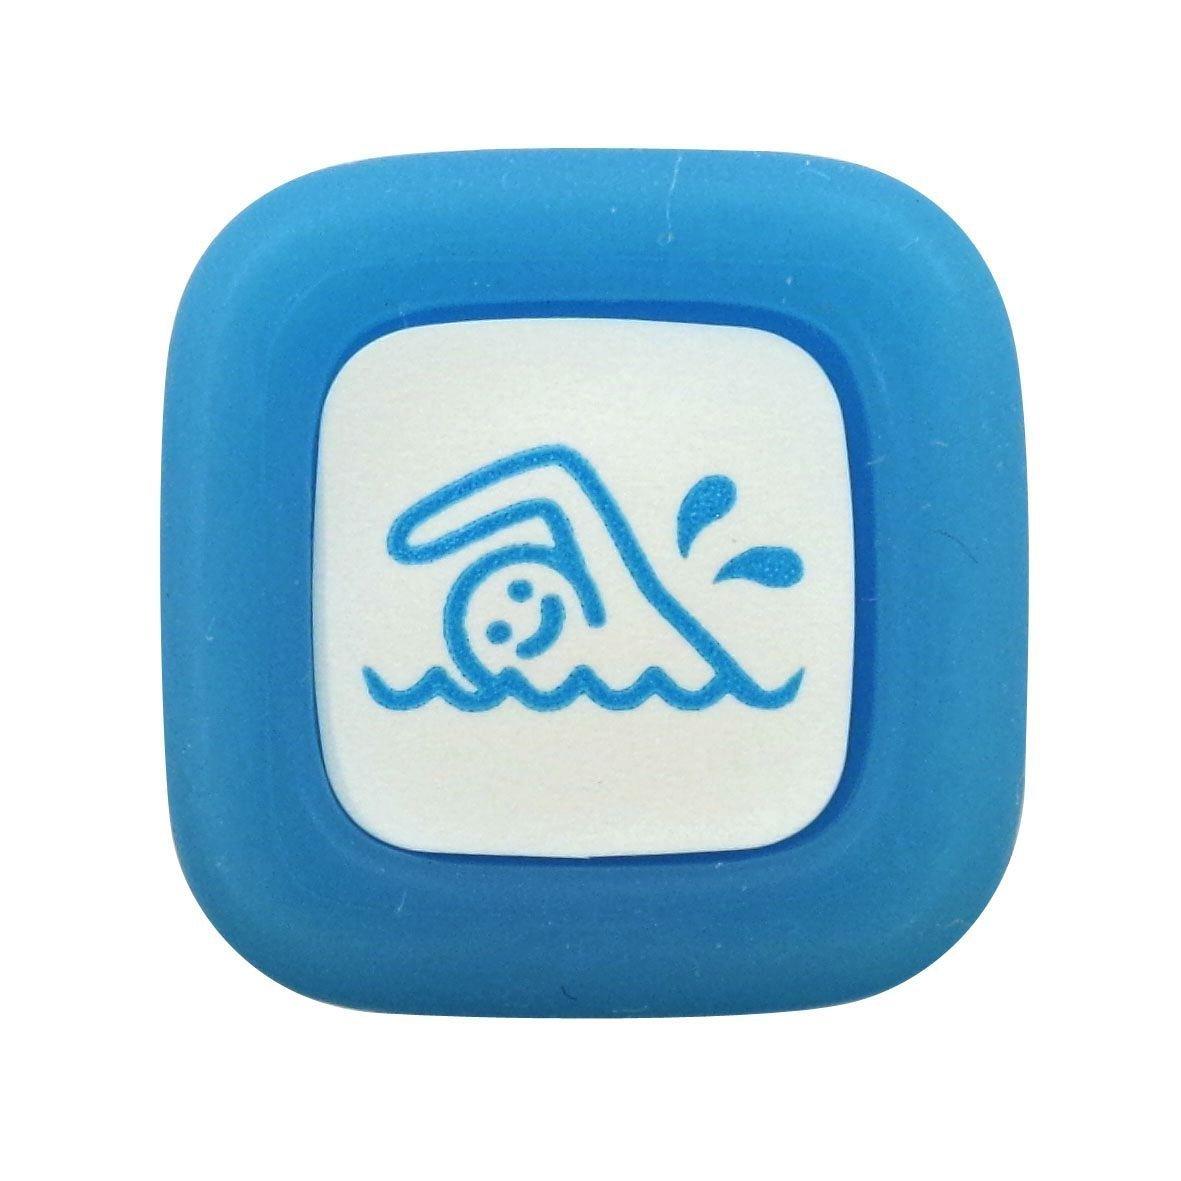 Pilot FriXion Stamp (цвет: голубой, клише: スイミング — suimingu — плаванье)